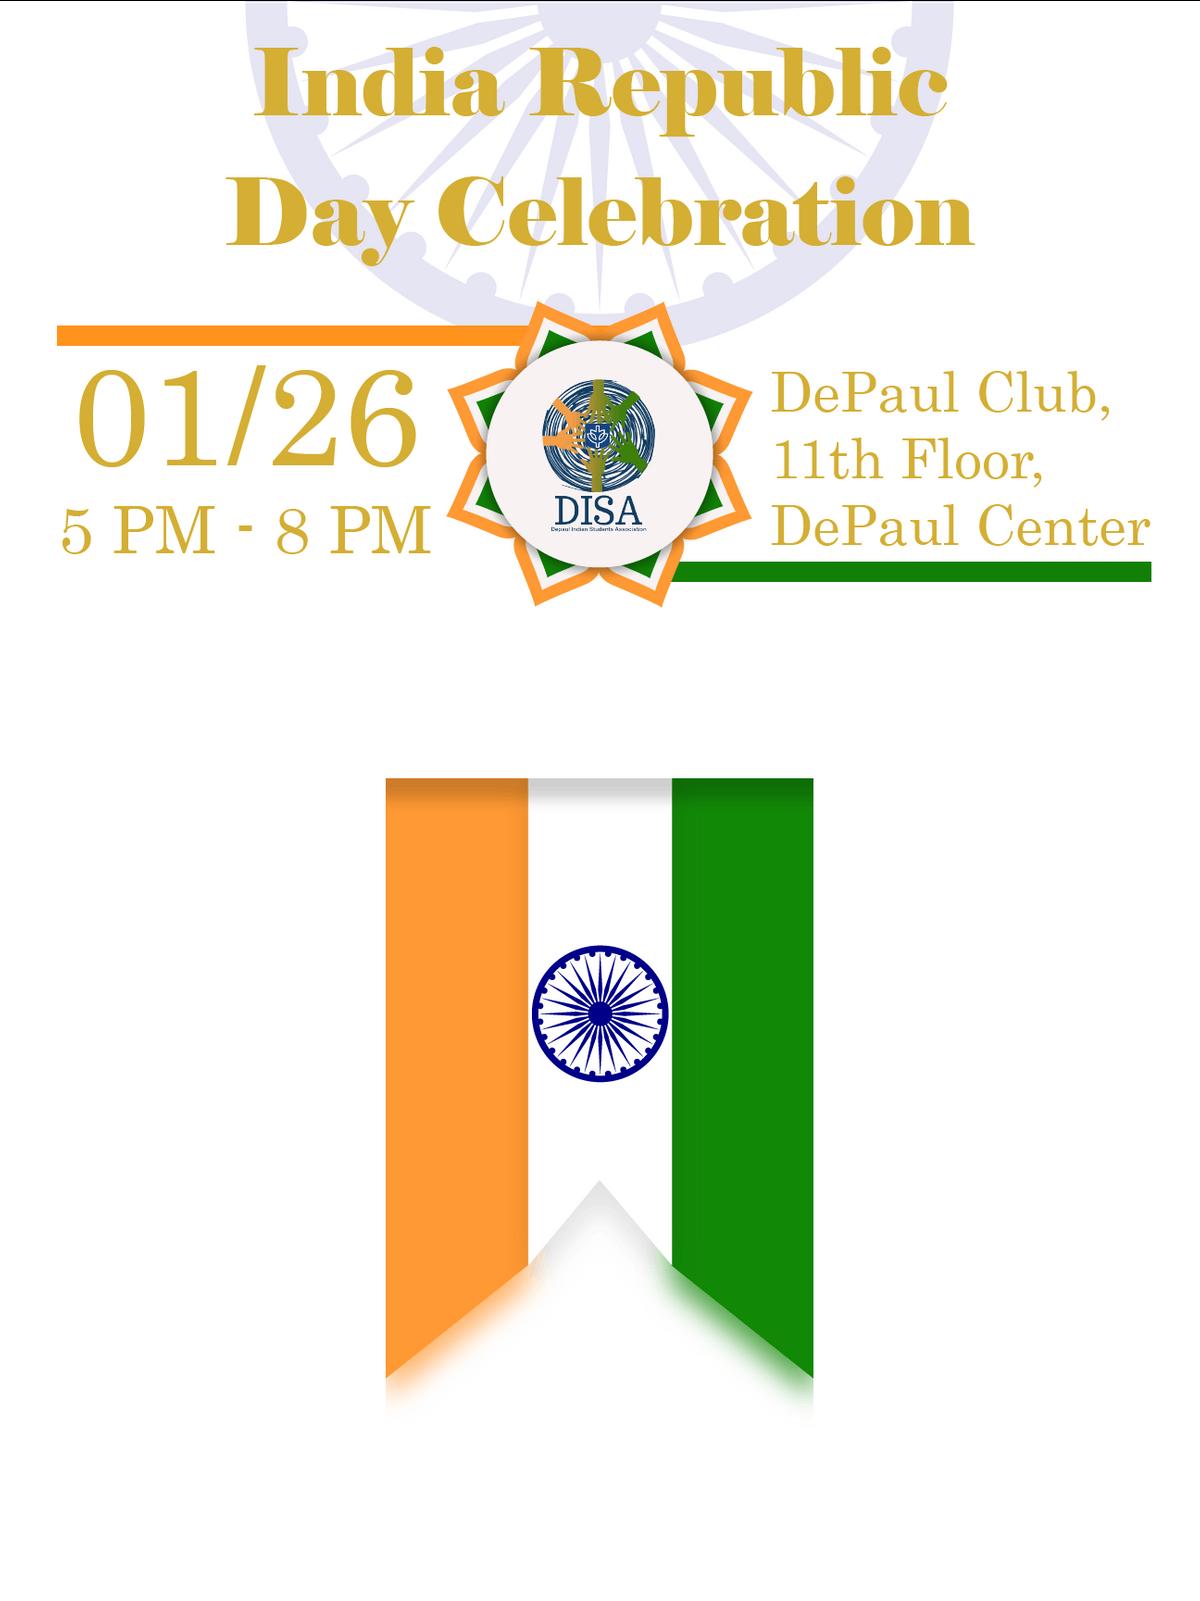 DISA India Republic Day Celebration